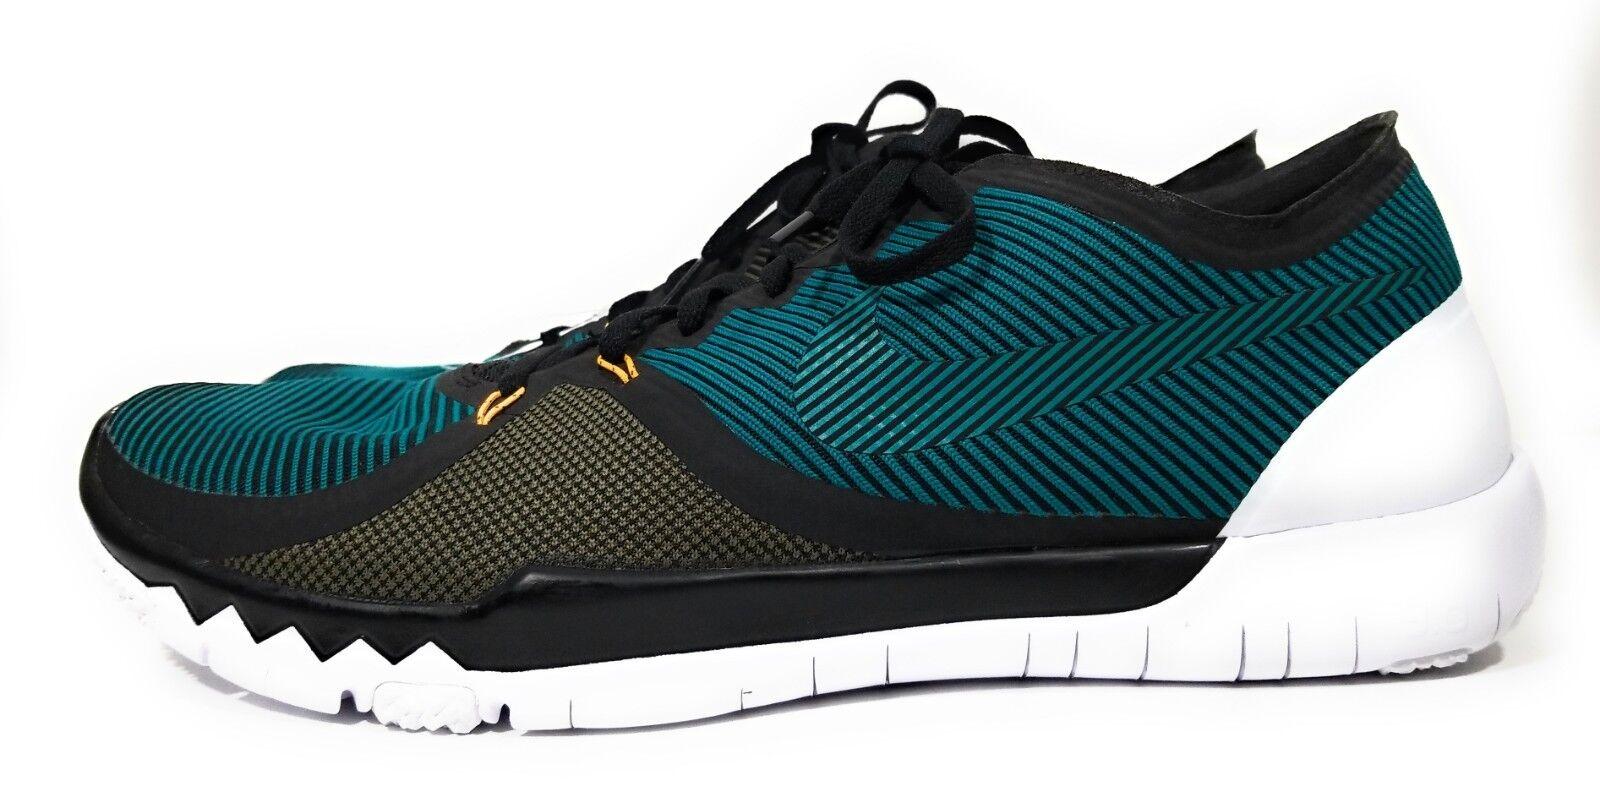 Nike Free Trainer 3.0 V4 Mens Running shoes Green Black Size 14